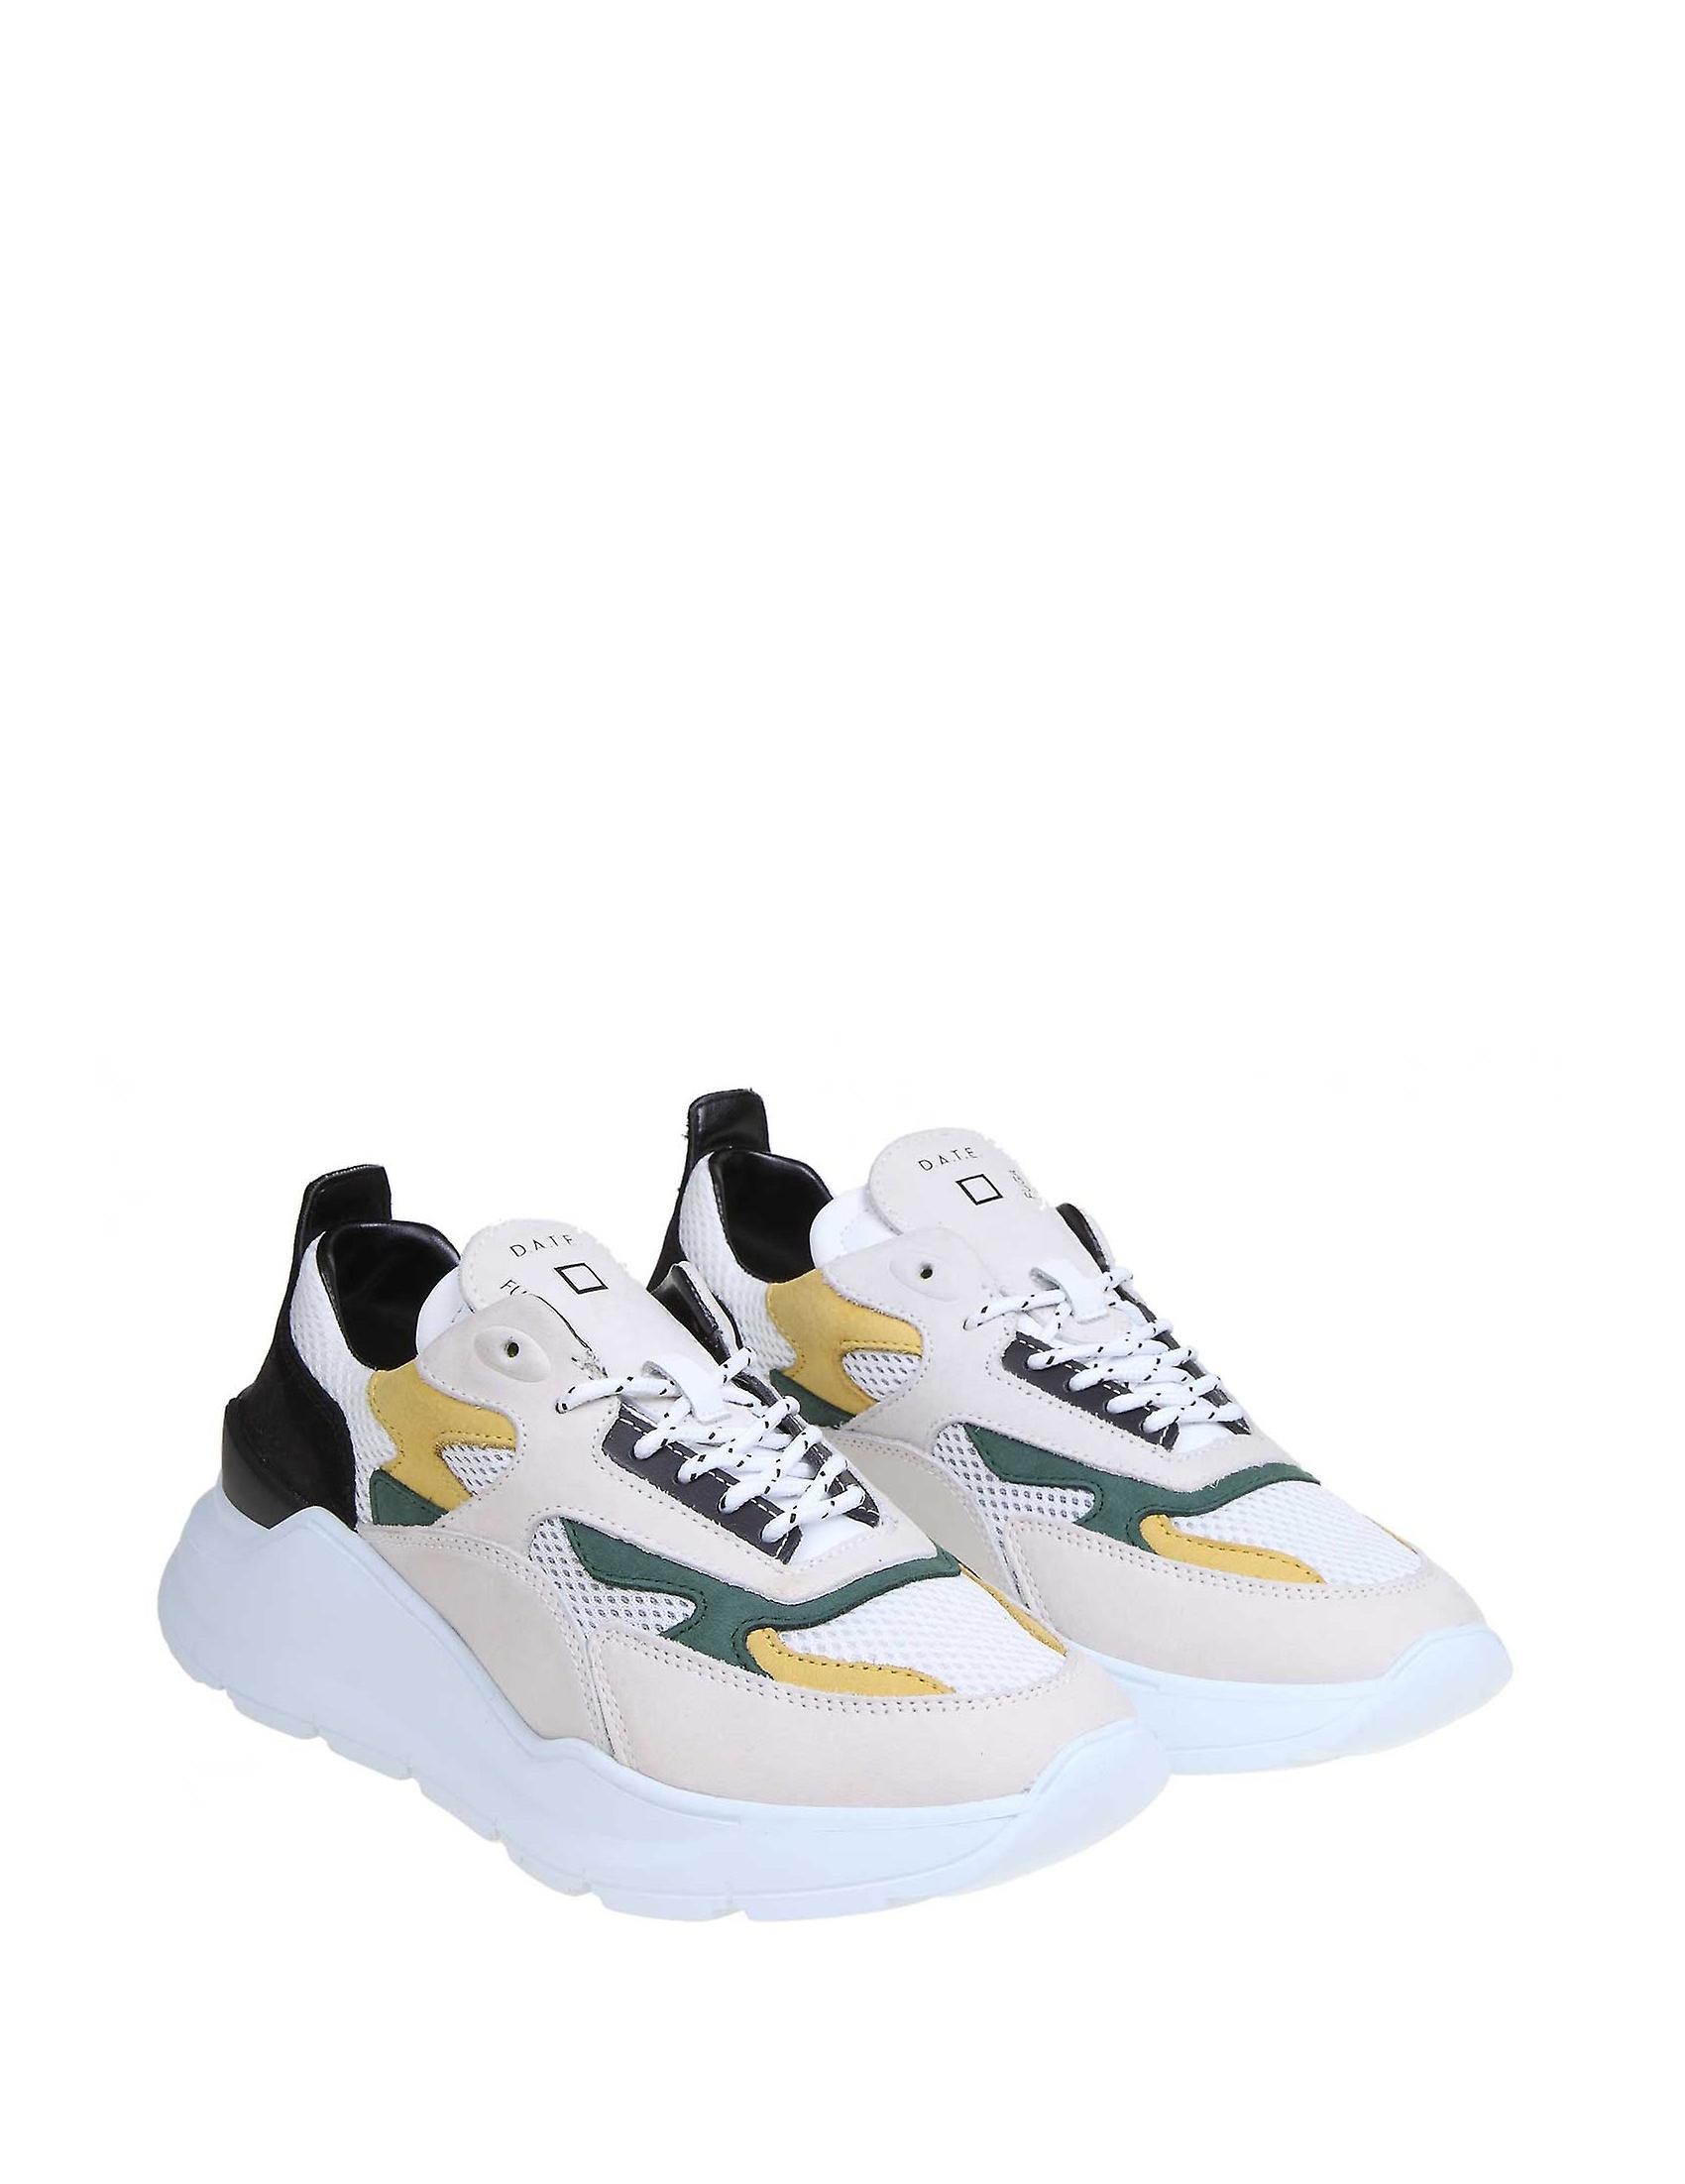 D.a.t.e. M321multicolor Men-apos;s Multicolor Leather Sneakers